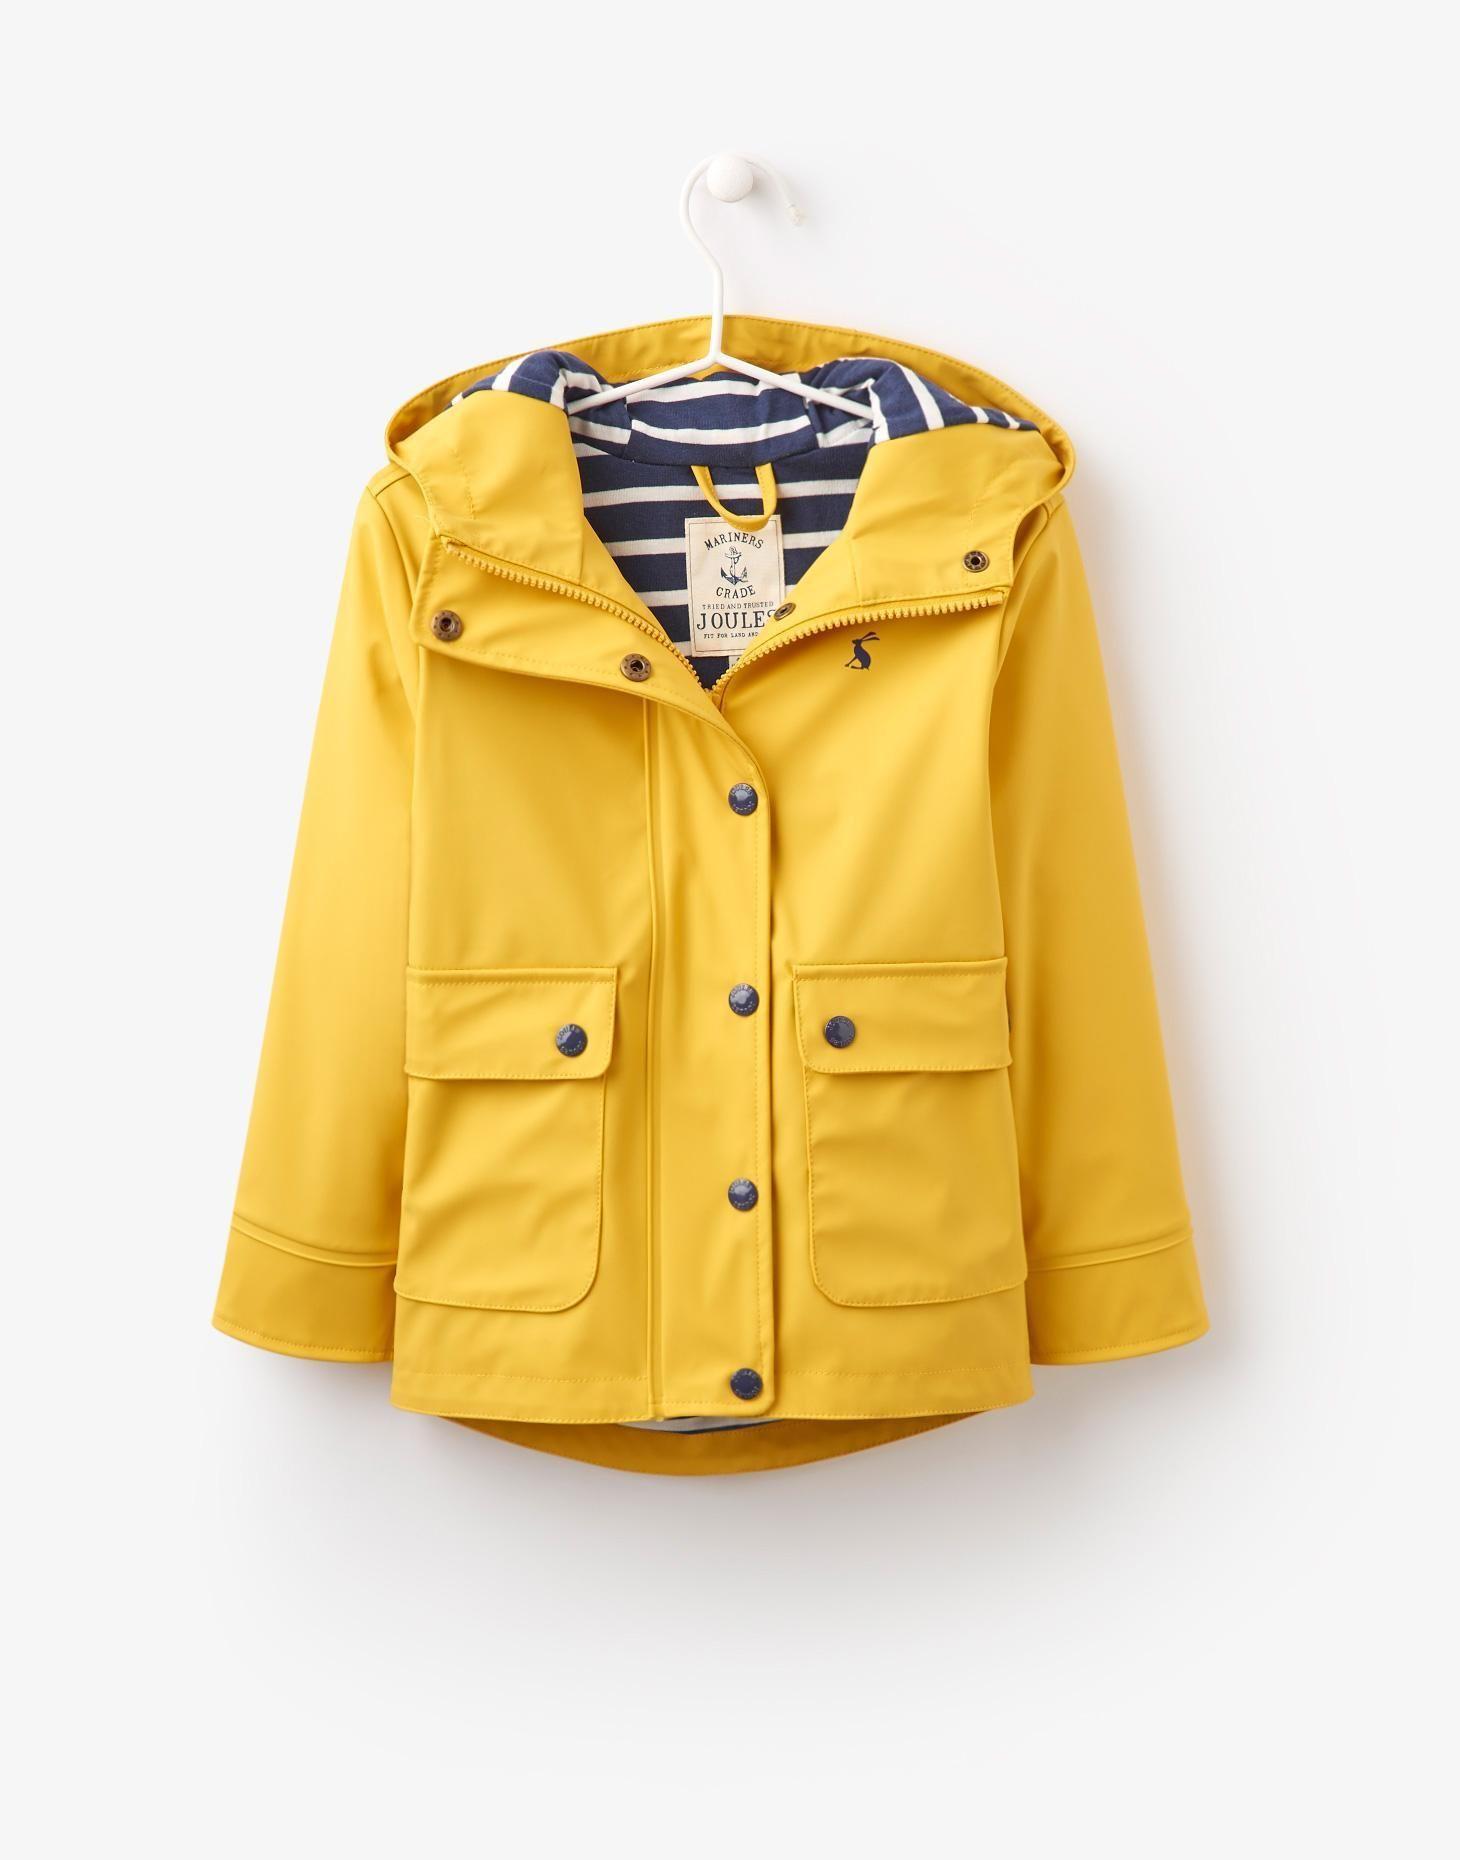 123947 Yellow Girls Waterproof Rubber Coat | Joules UK | Dressing ...